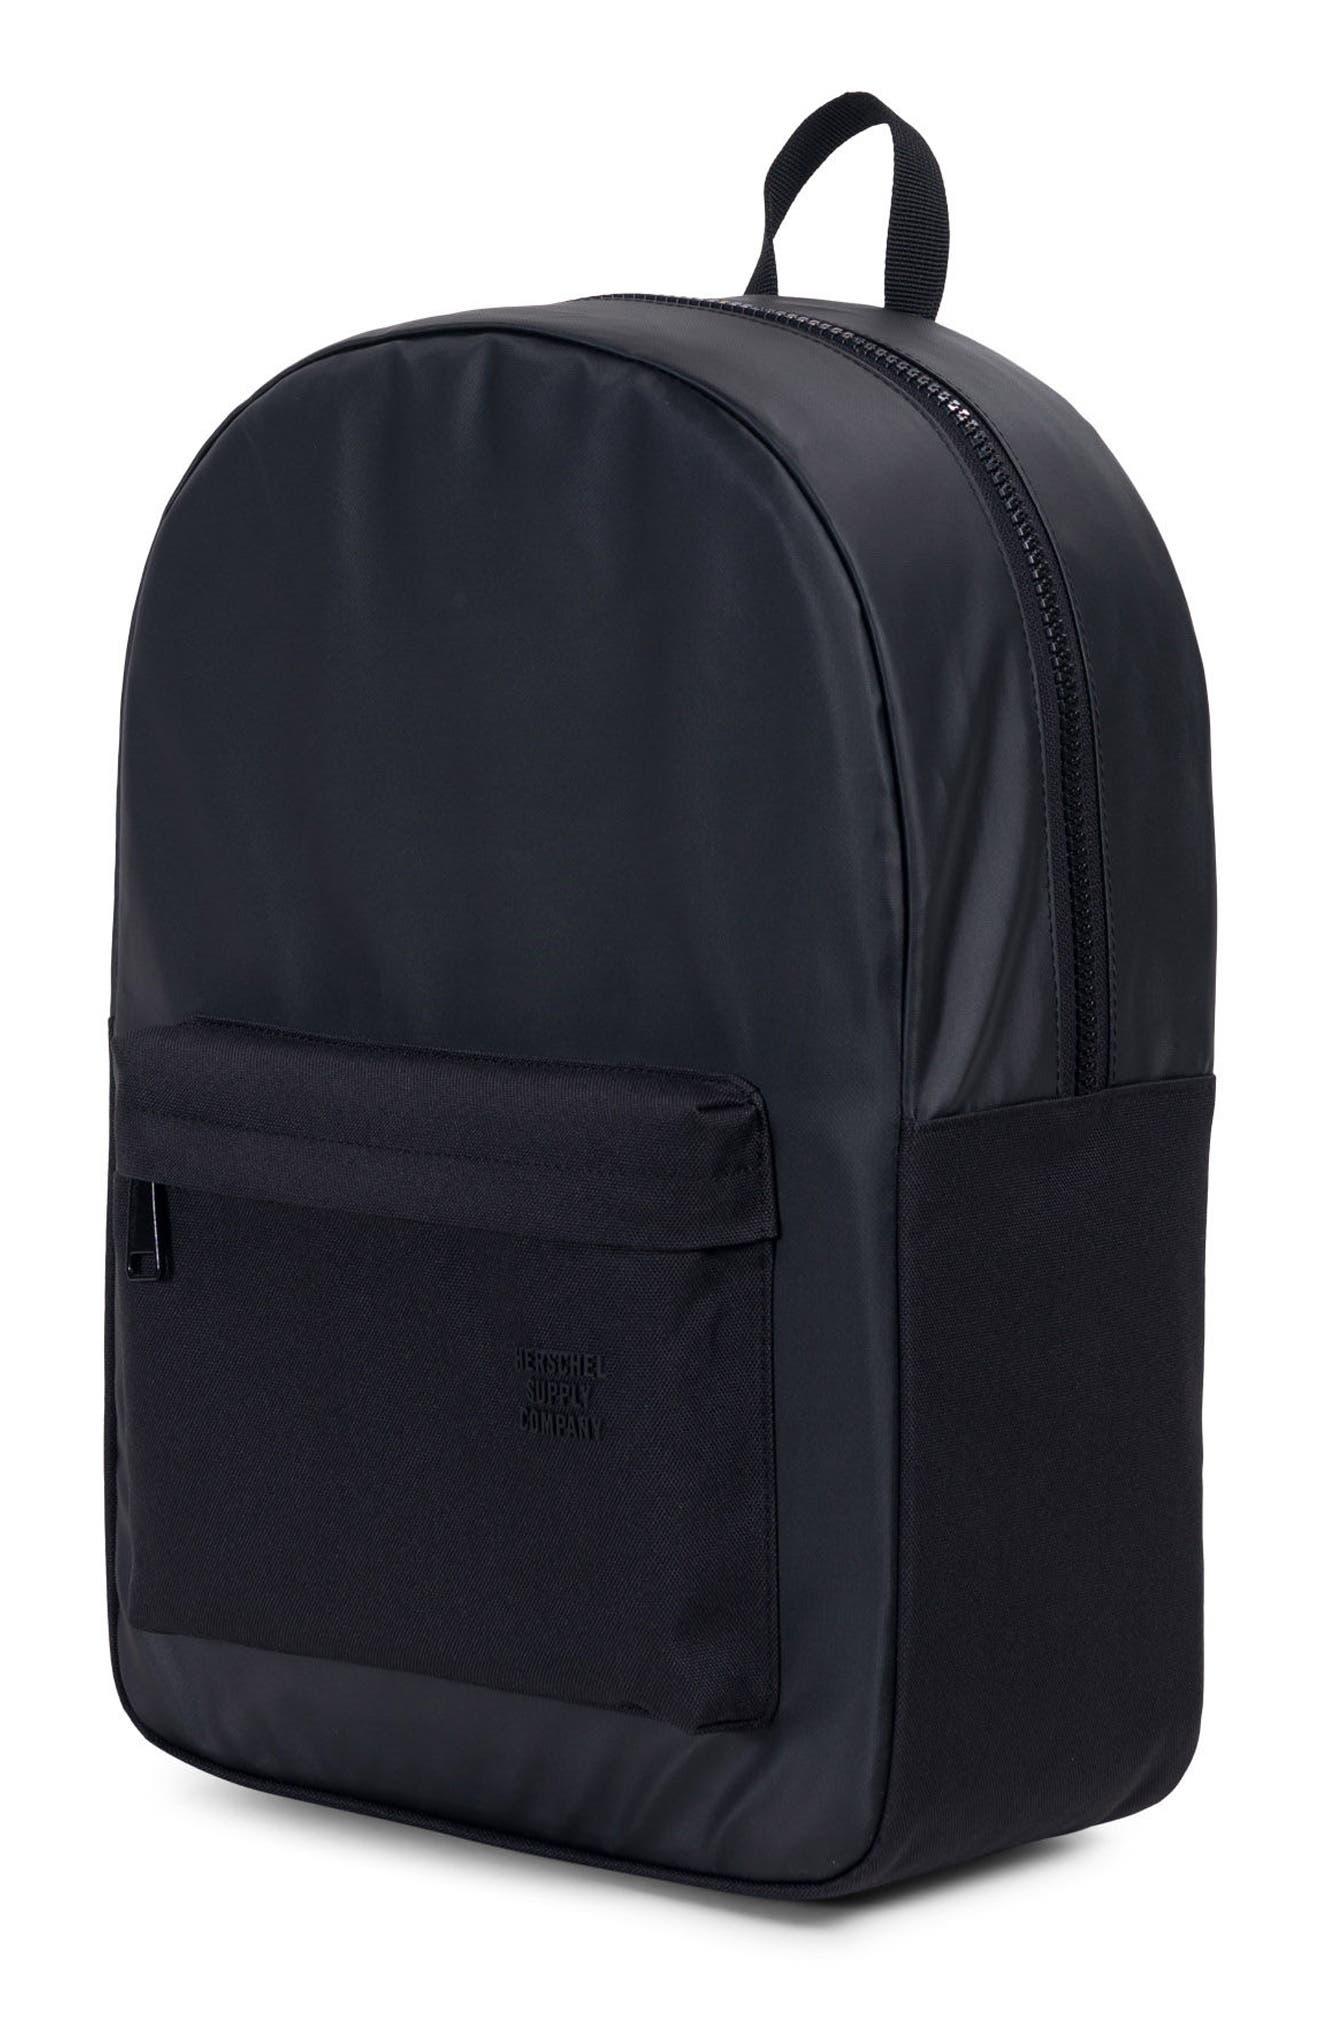 Winlaw Polycoat Studio Backpack,                             Alternate thumbnail 4, color,                             Black